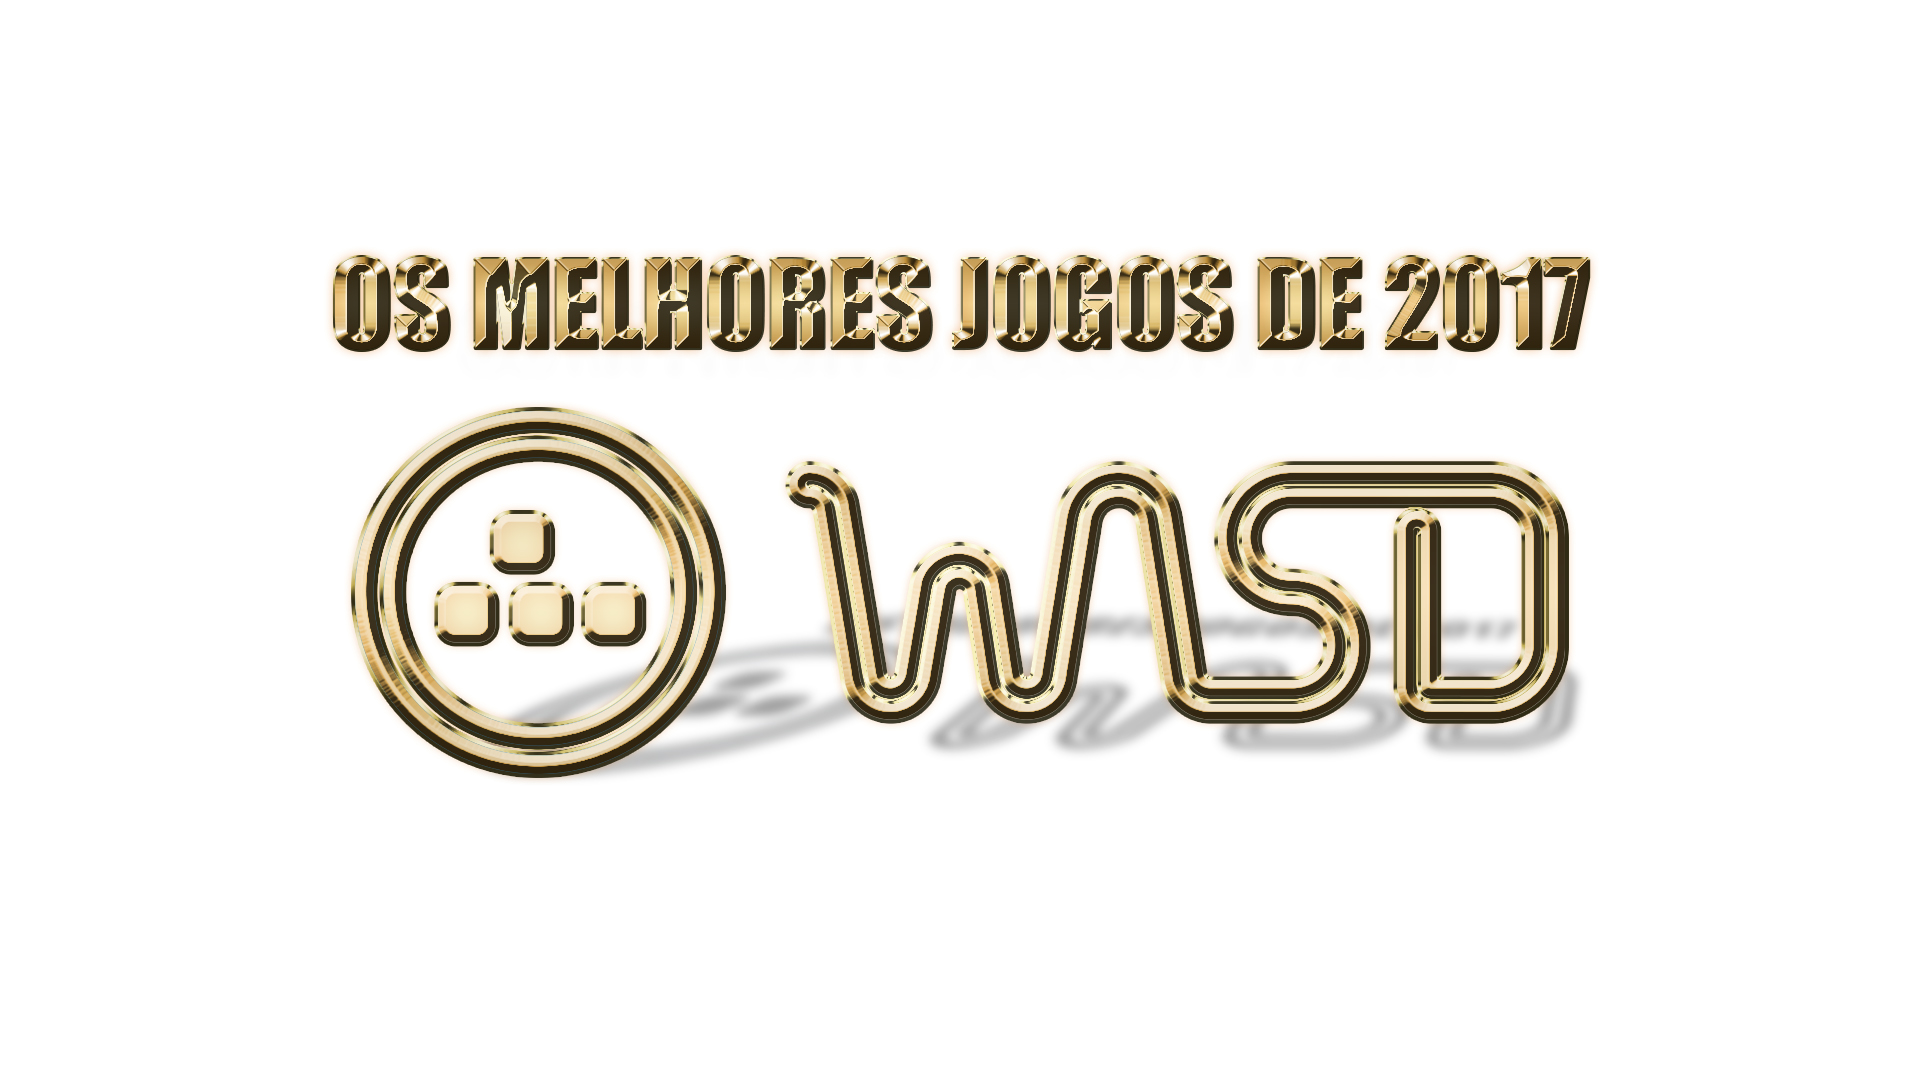 Os Jogos do Ano de 2017 para o WASD